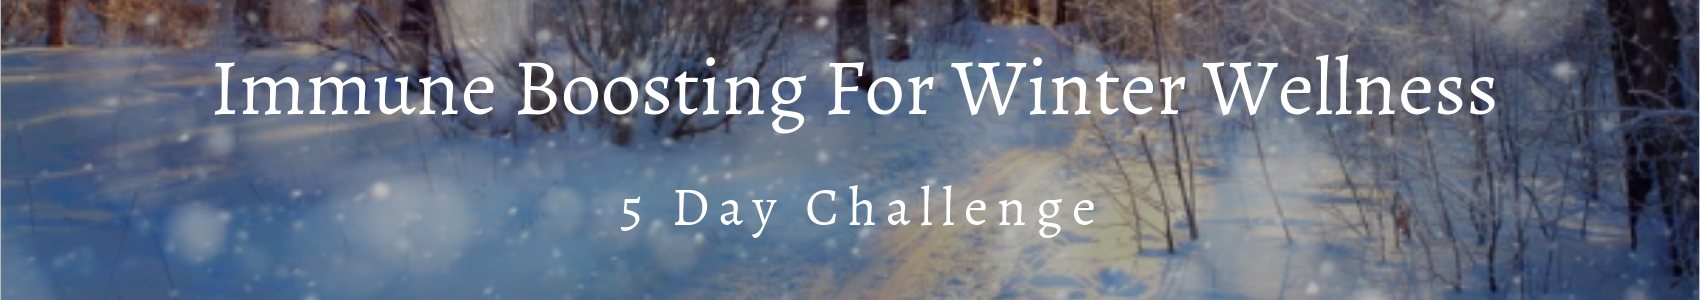 Immune Boosting for Winter Wellness